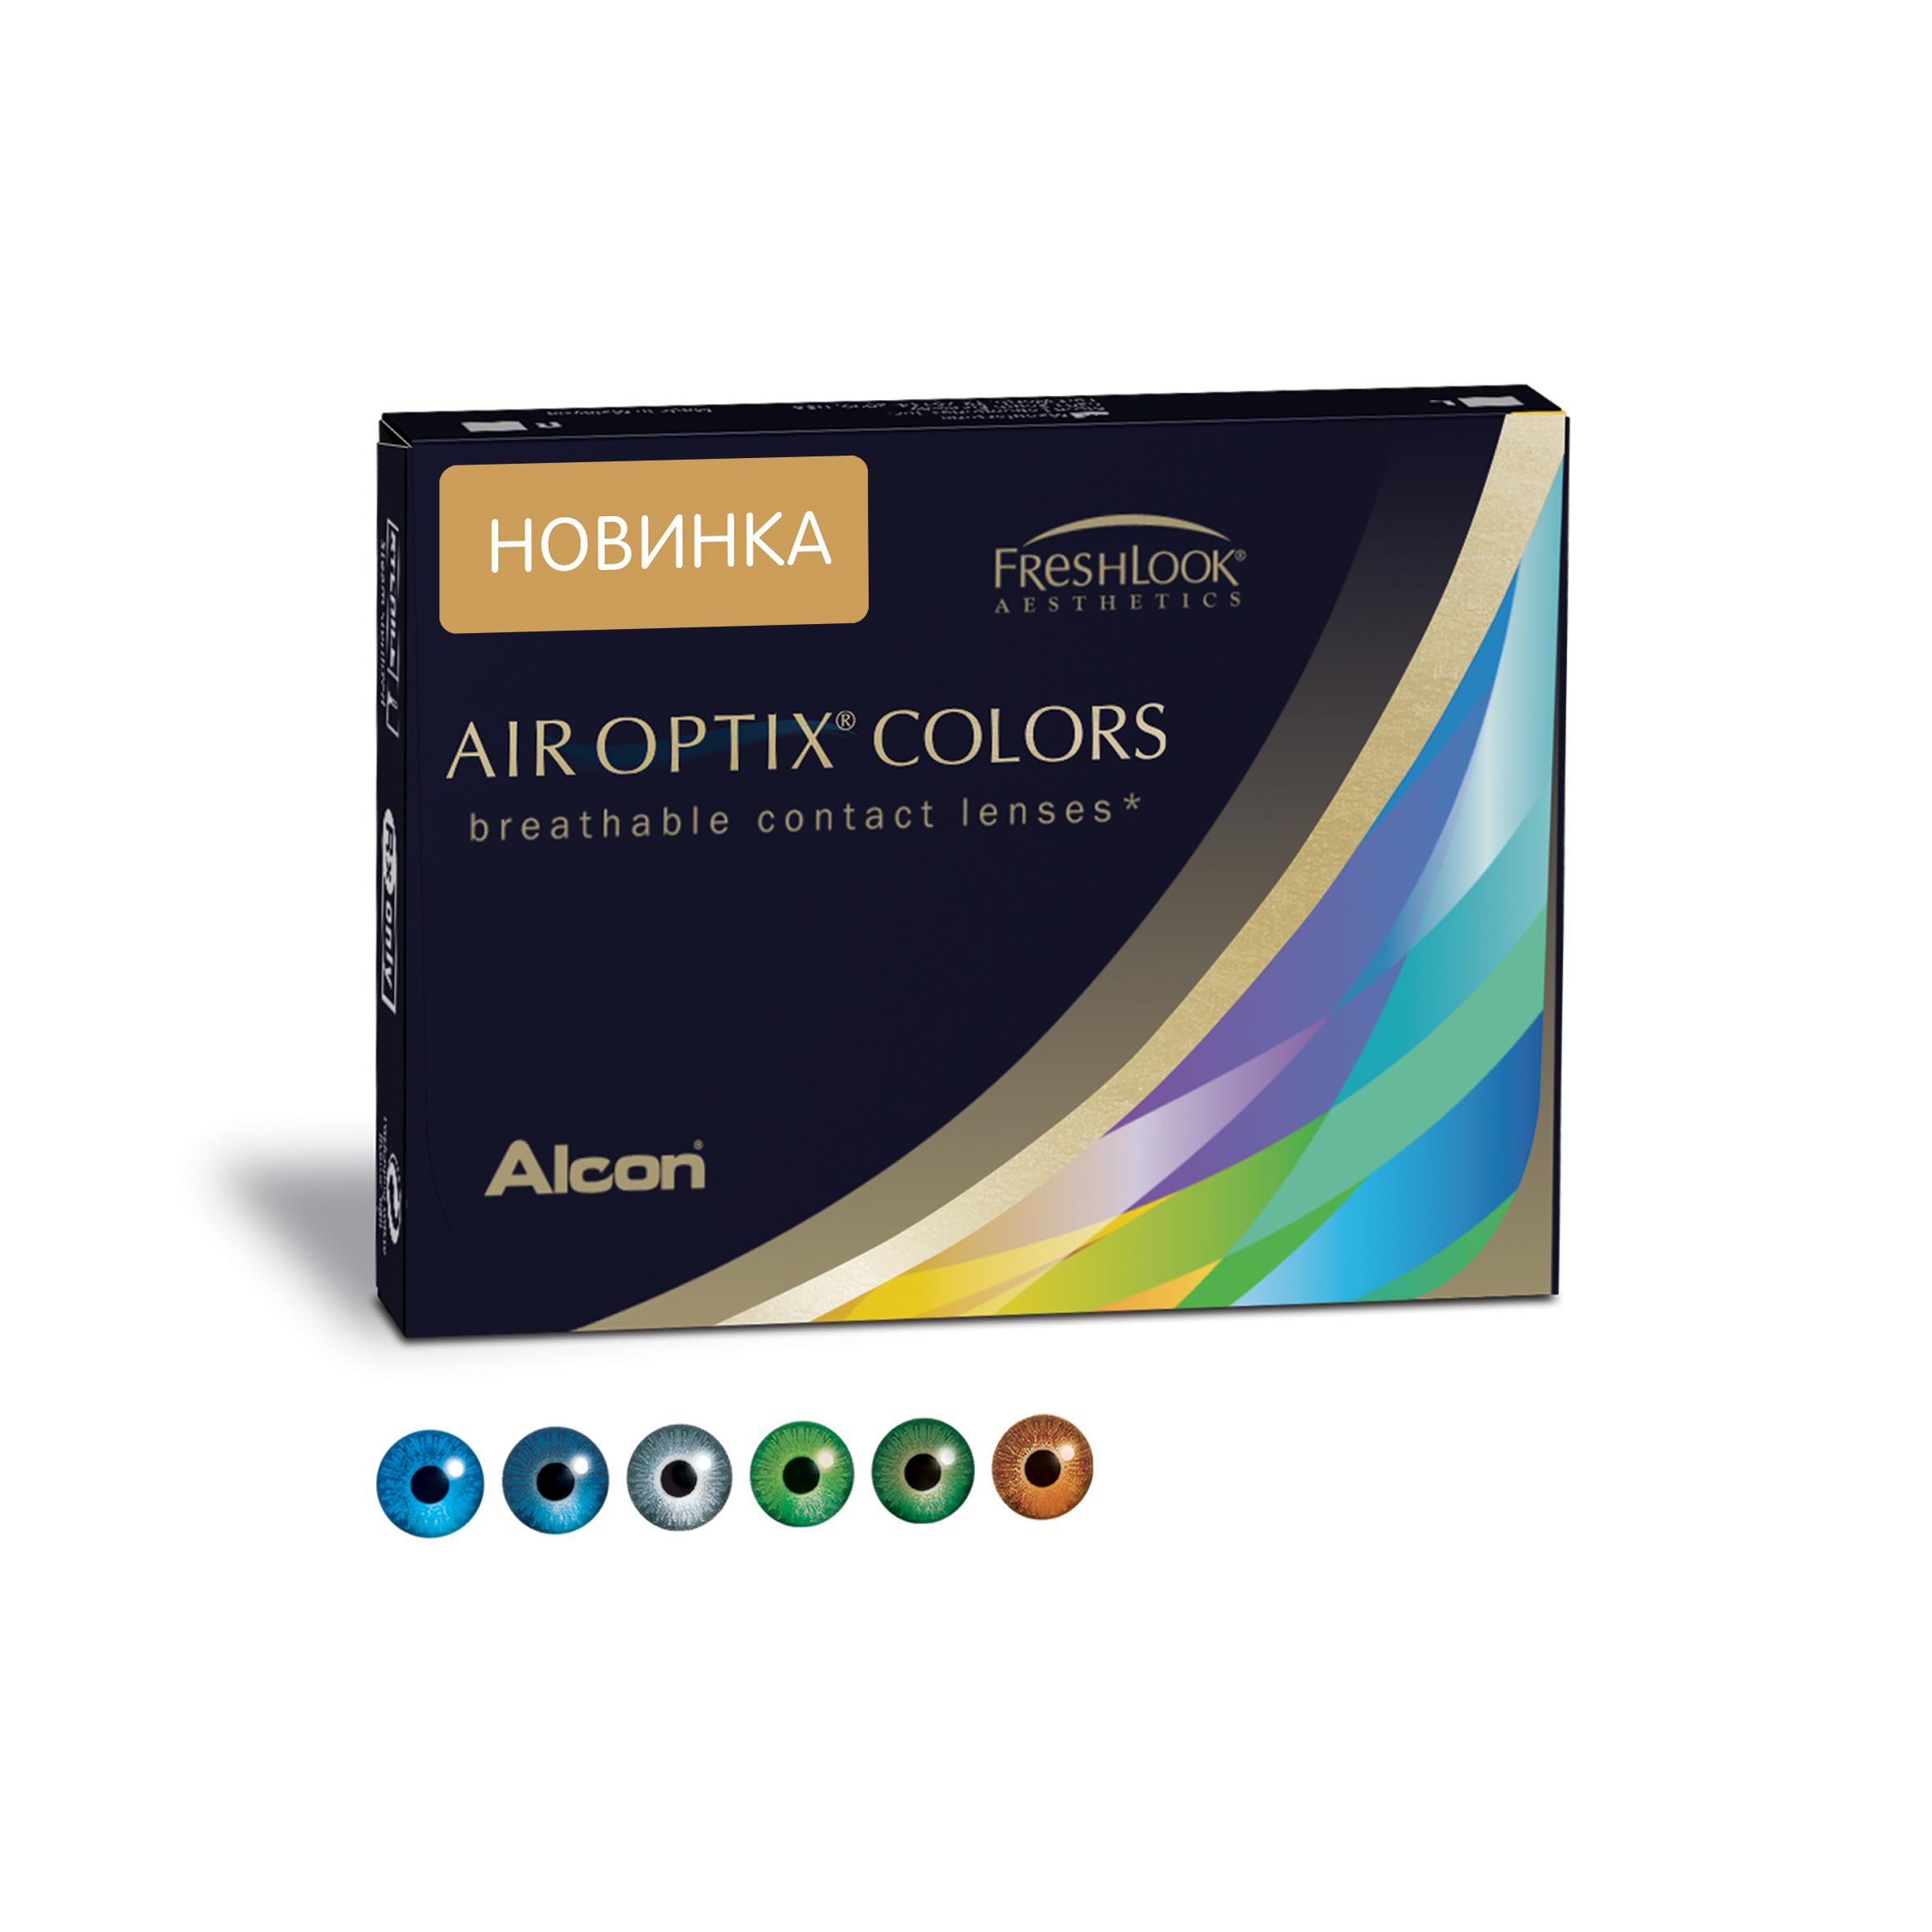 Аlcon контактные линзы Air Optix Colors 2 шт -5.50 Brilliant Blue ( 31746284 )